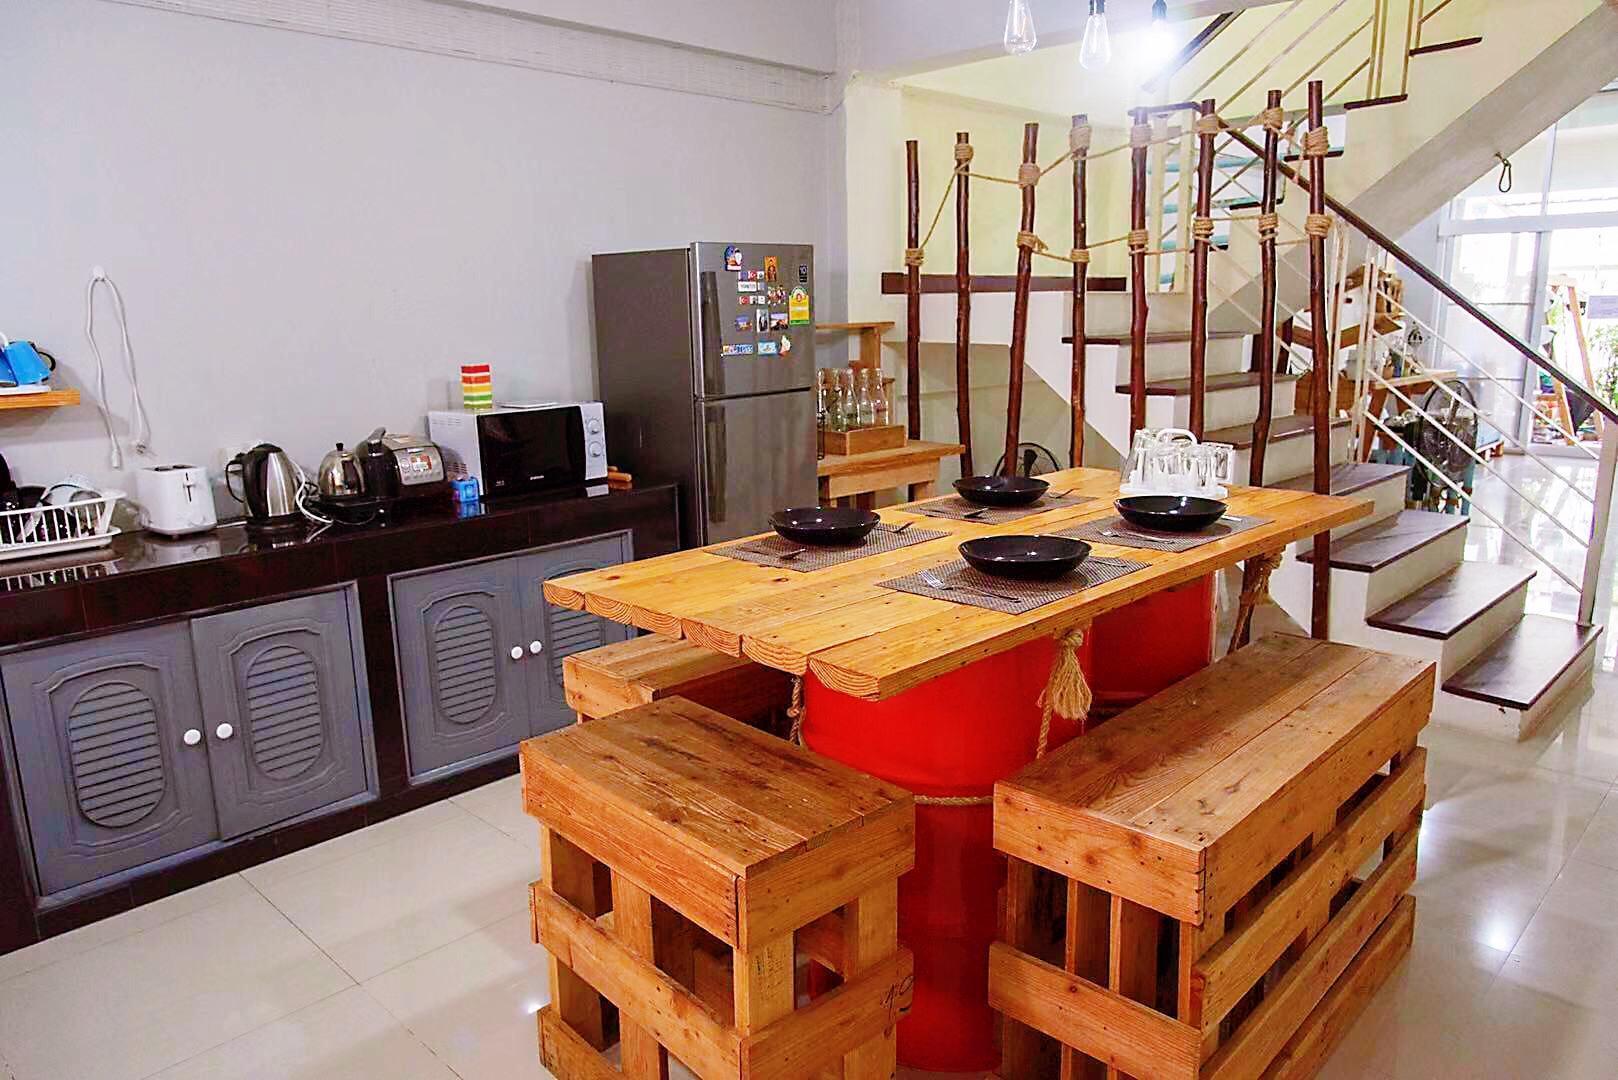 Chiang Mai Tonghua 2 House วิลลา 4 ห้องนอน 5 ห้องน้ำส่วนตัว ขนาด 300 ตร.ม. – นิมมานเหมินทร์